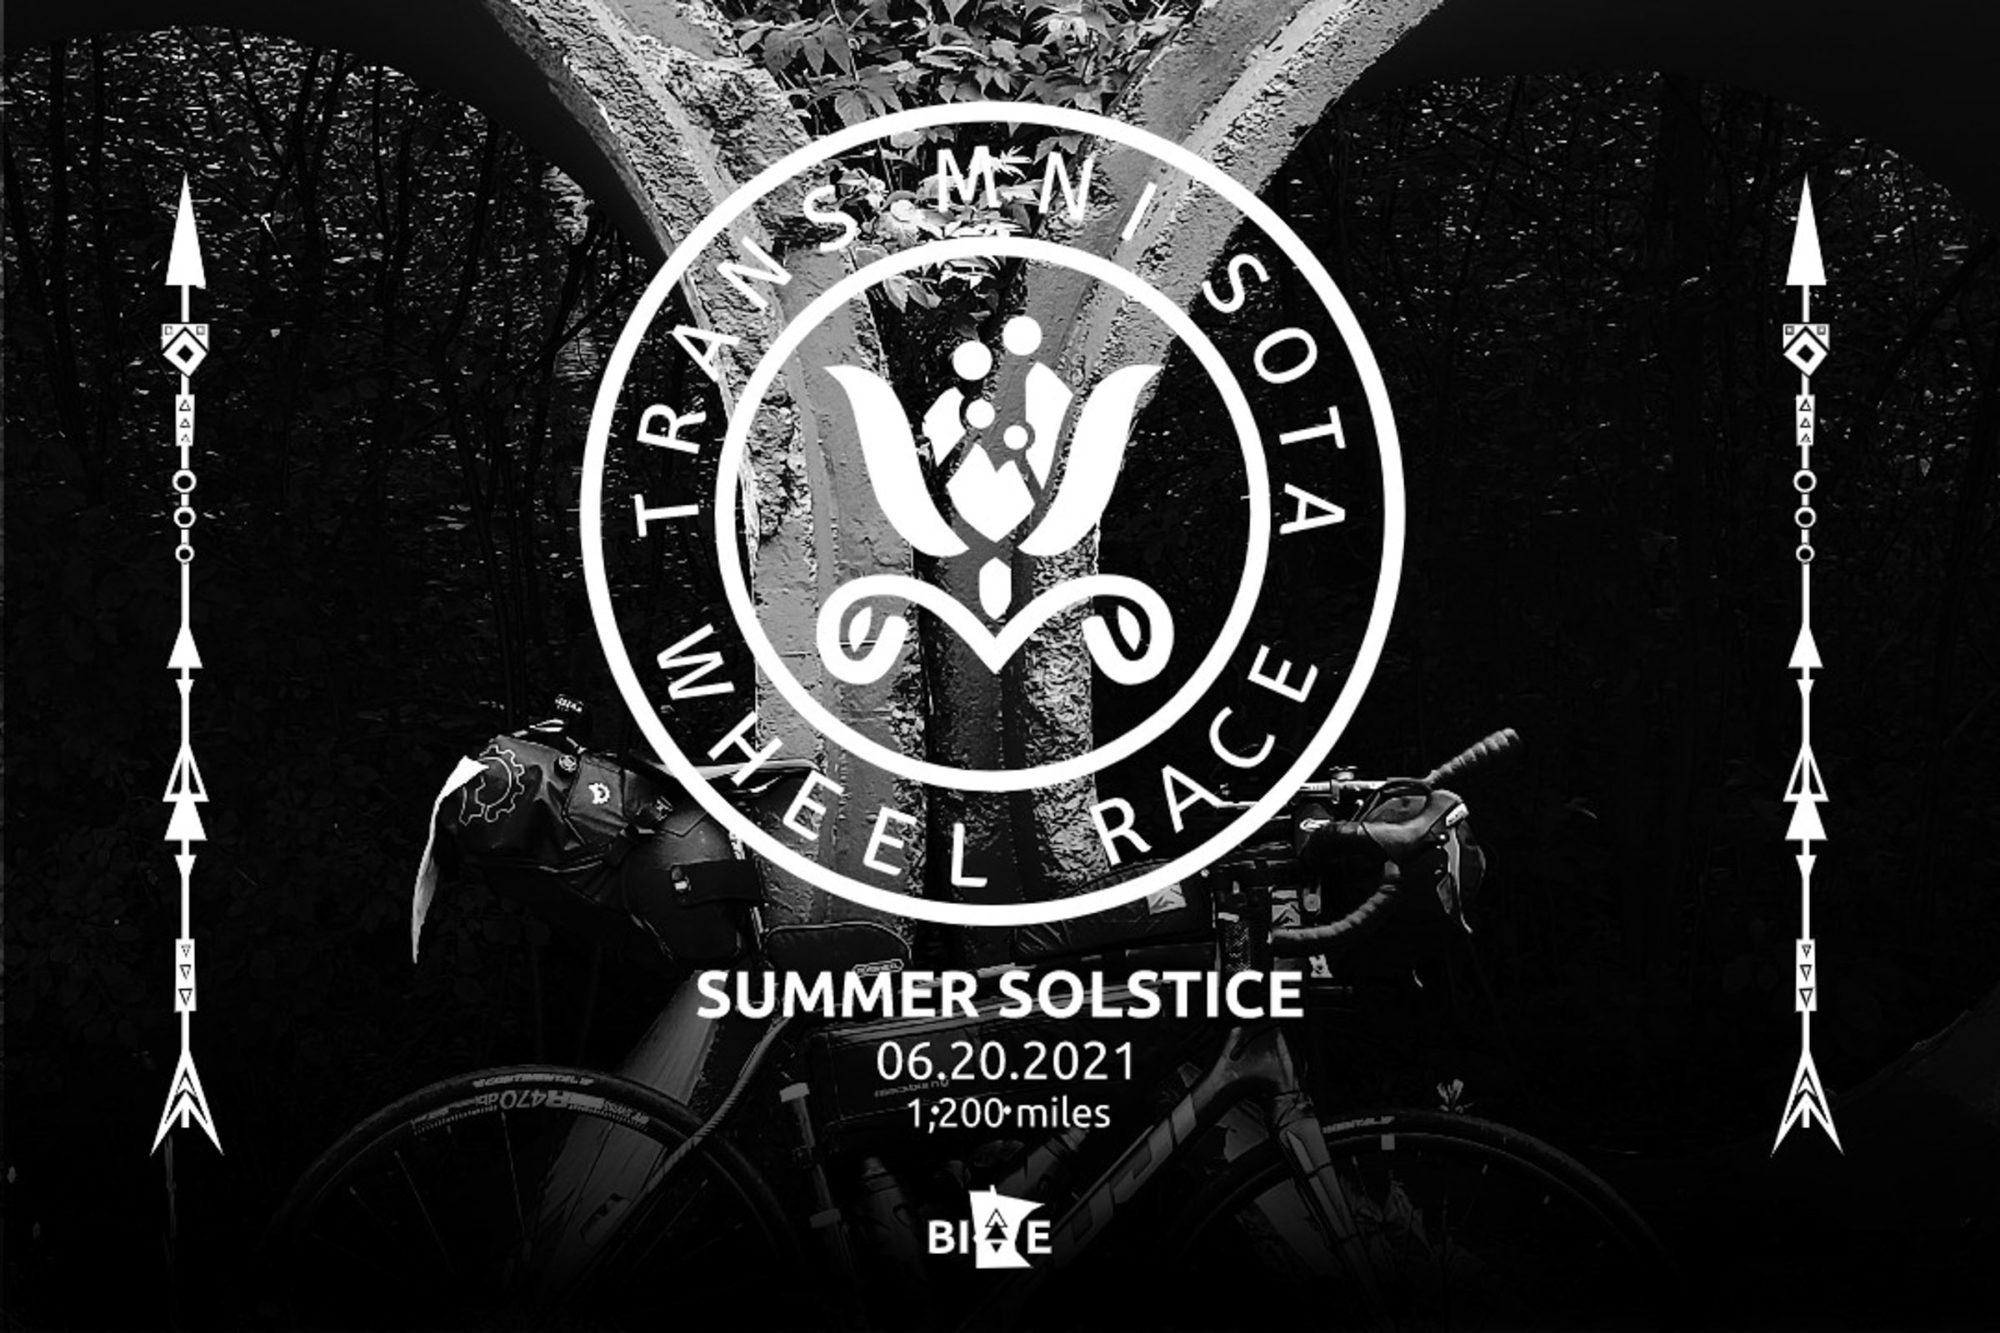 Trans Mni Sota Makoce Wheel Race (2021) – Bikepacking Inside White Bear Lake Activities Calendar 2021 2021